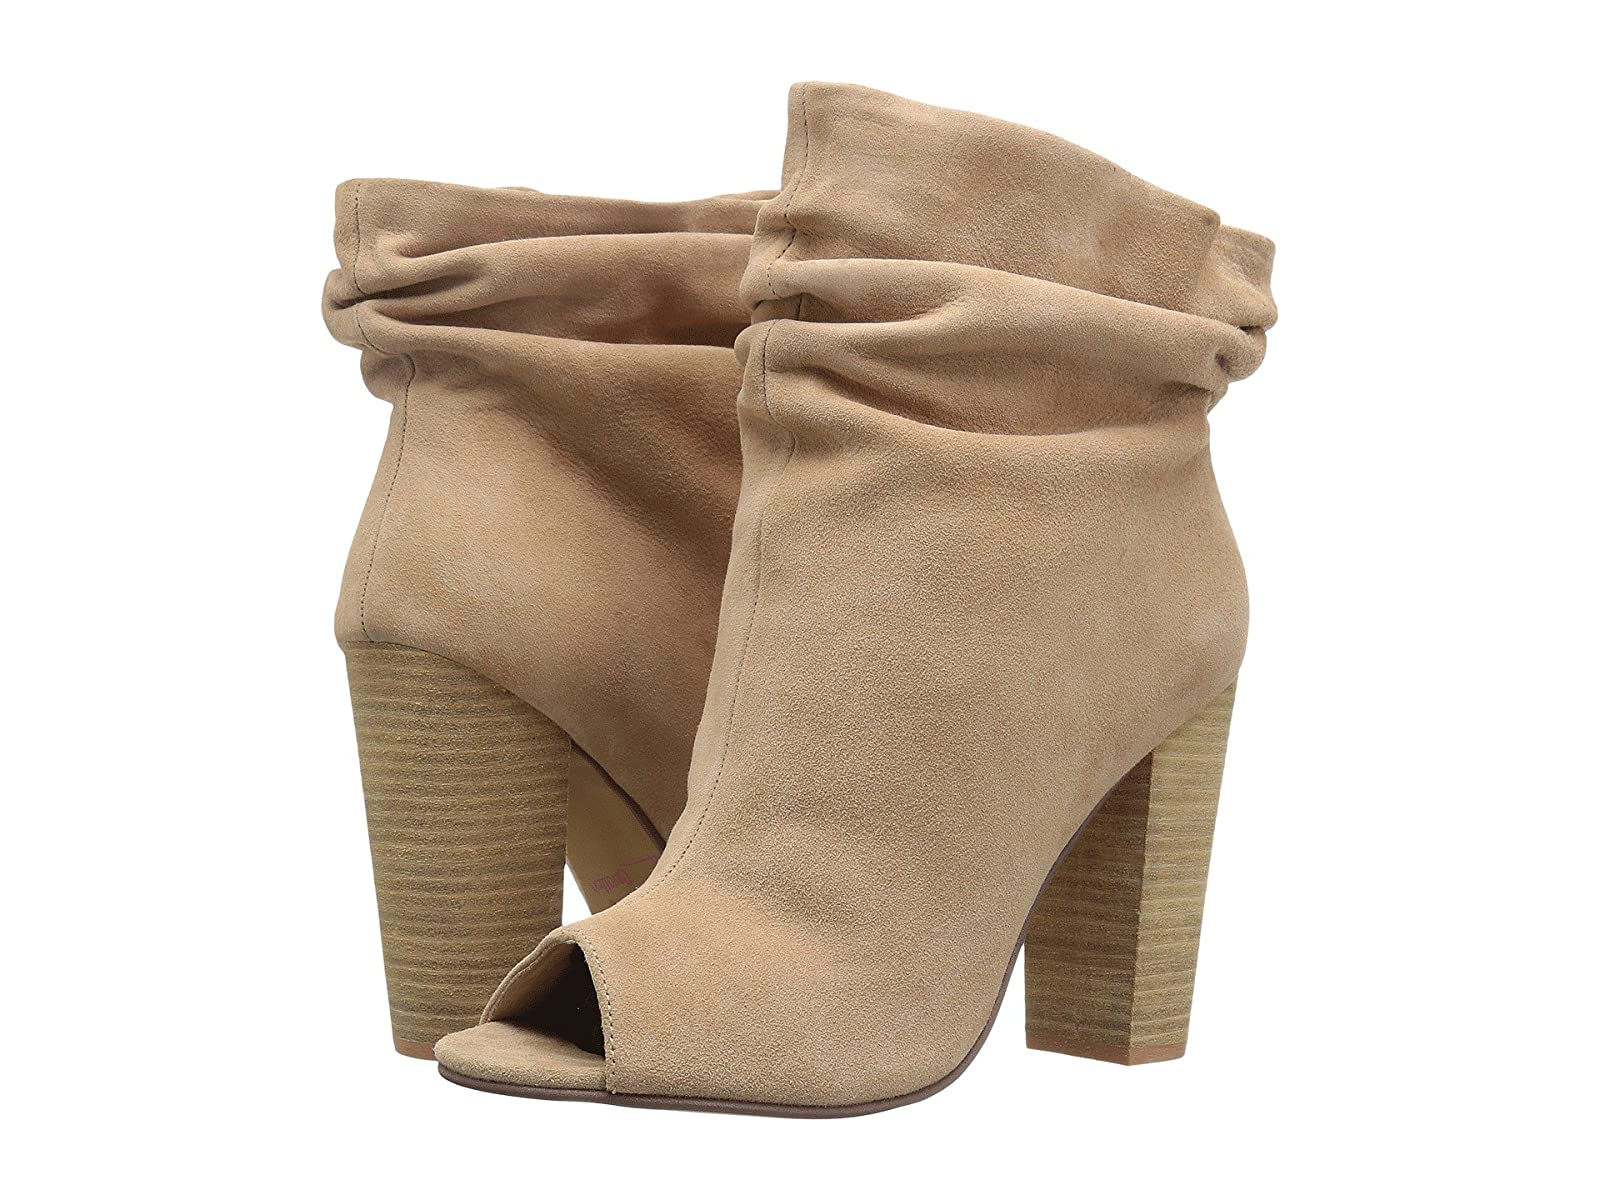 Kristin Cavallari Laurel Peep Toe BootieCheap and distinctive eye-catching shoes